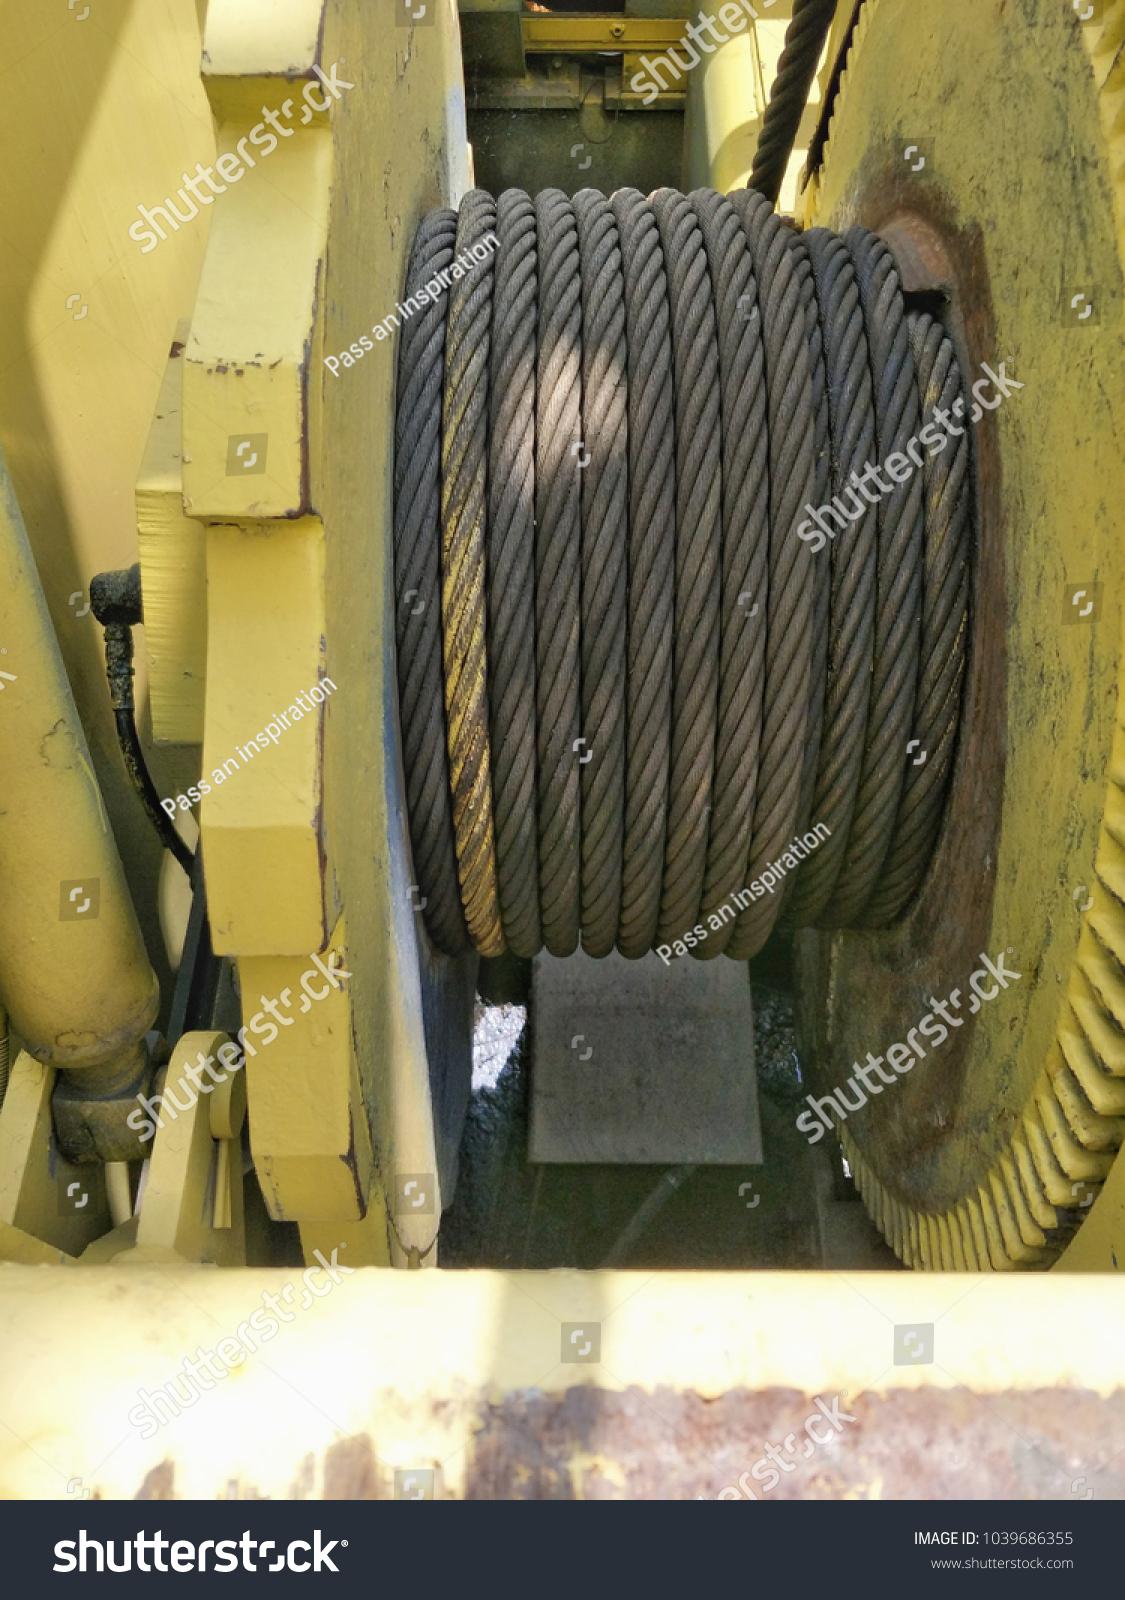 Sling Dump Wire Rope Crawler Crane Stock Photo Edit Now 1039686355 Powerhorse Engine Wiring Diagram Of